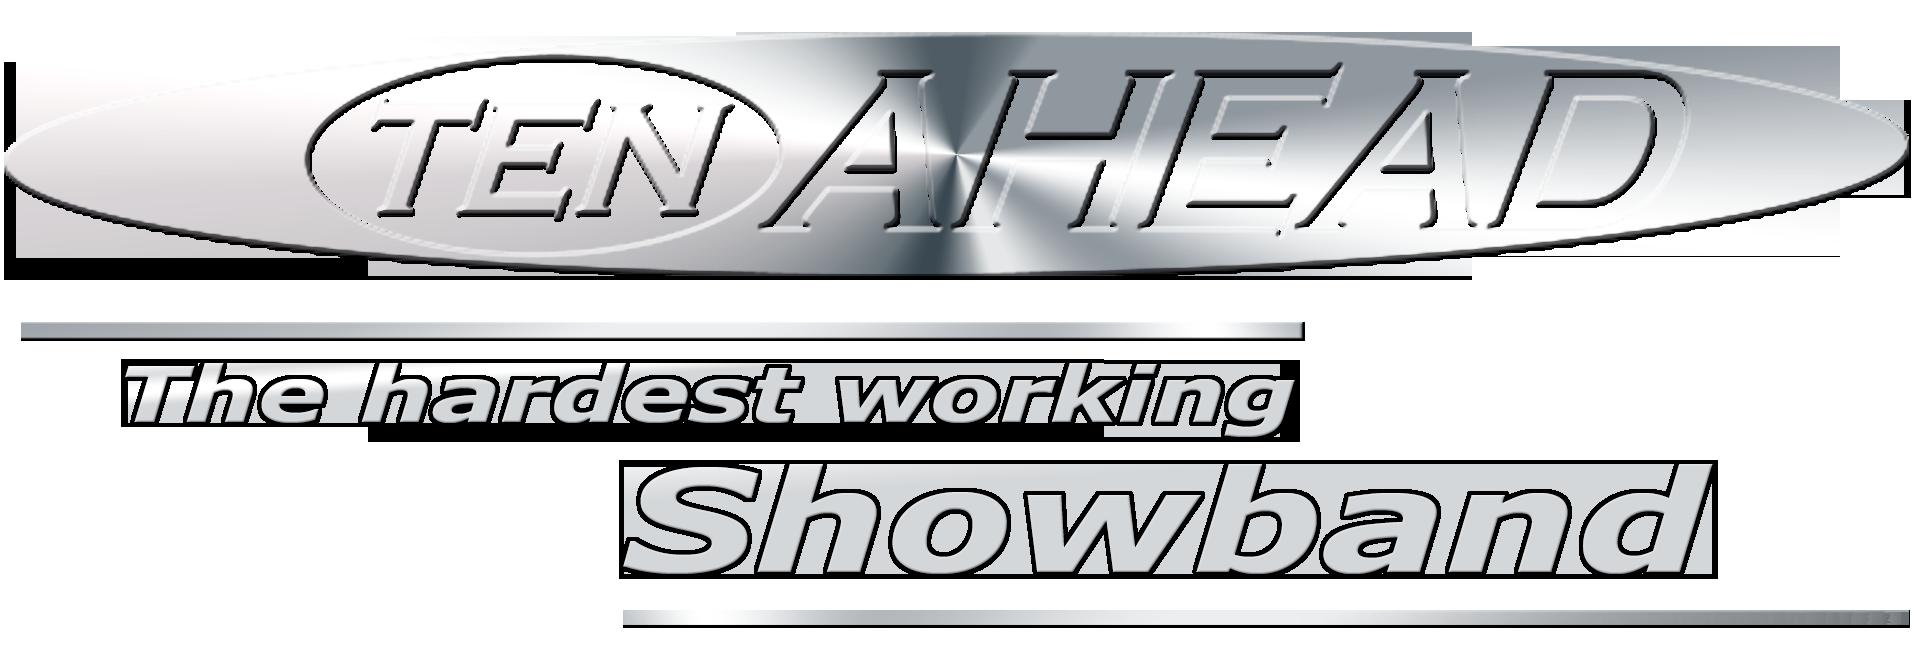 Logo der Liveband Köln Ten Ahead - Showband, Coverband, Partyband, Download